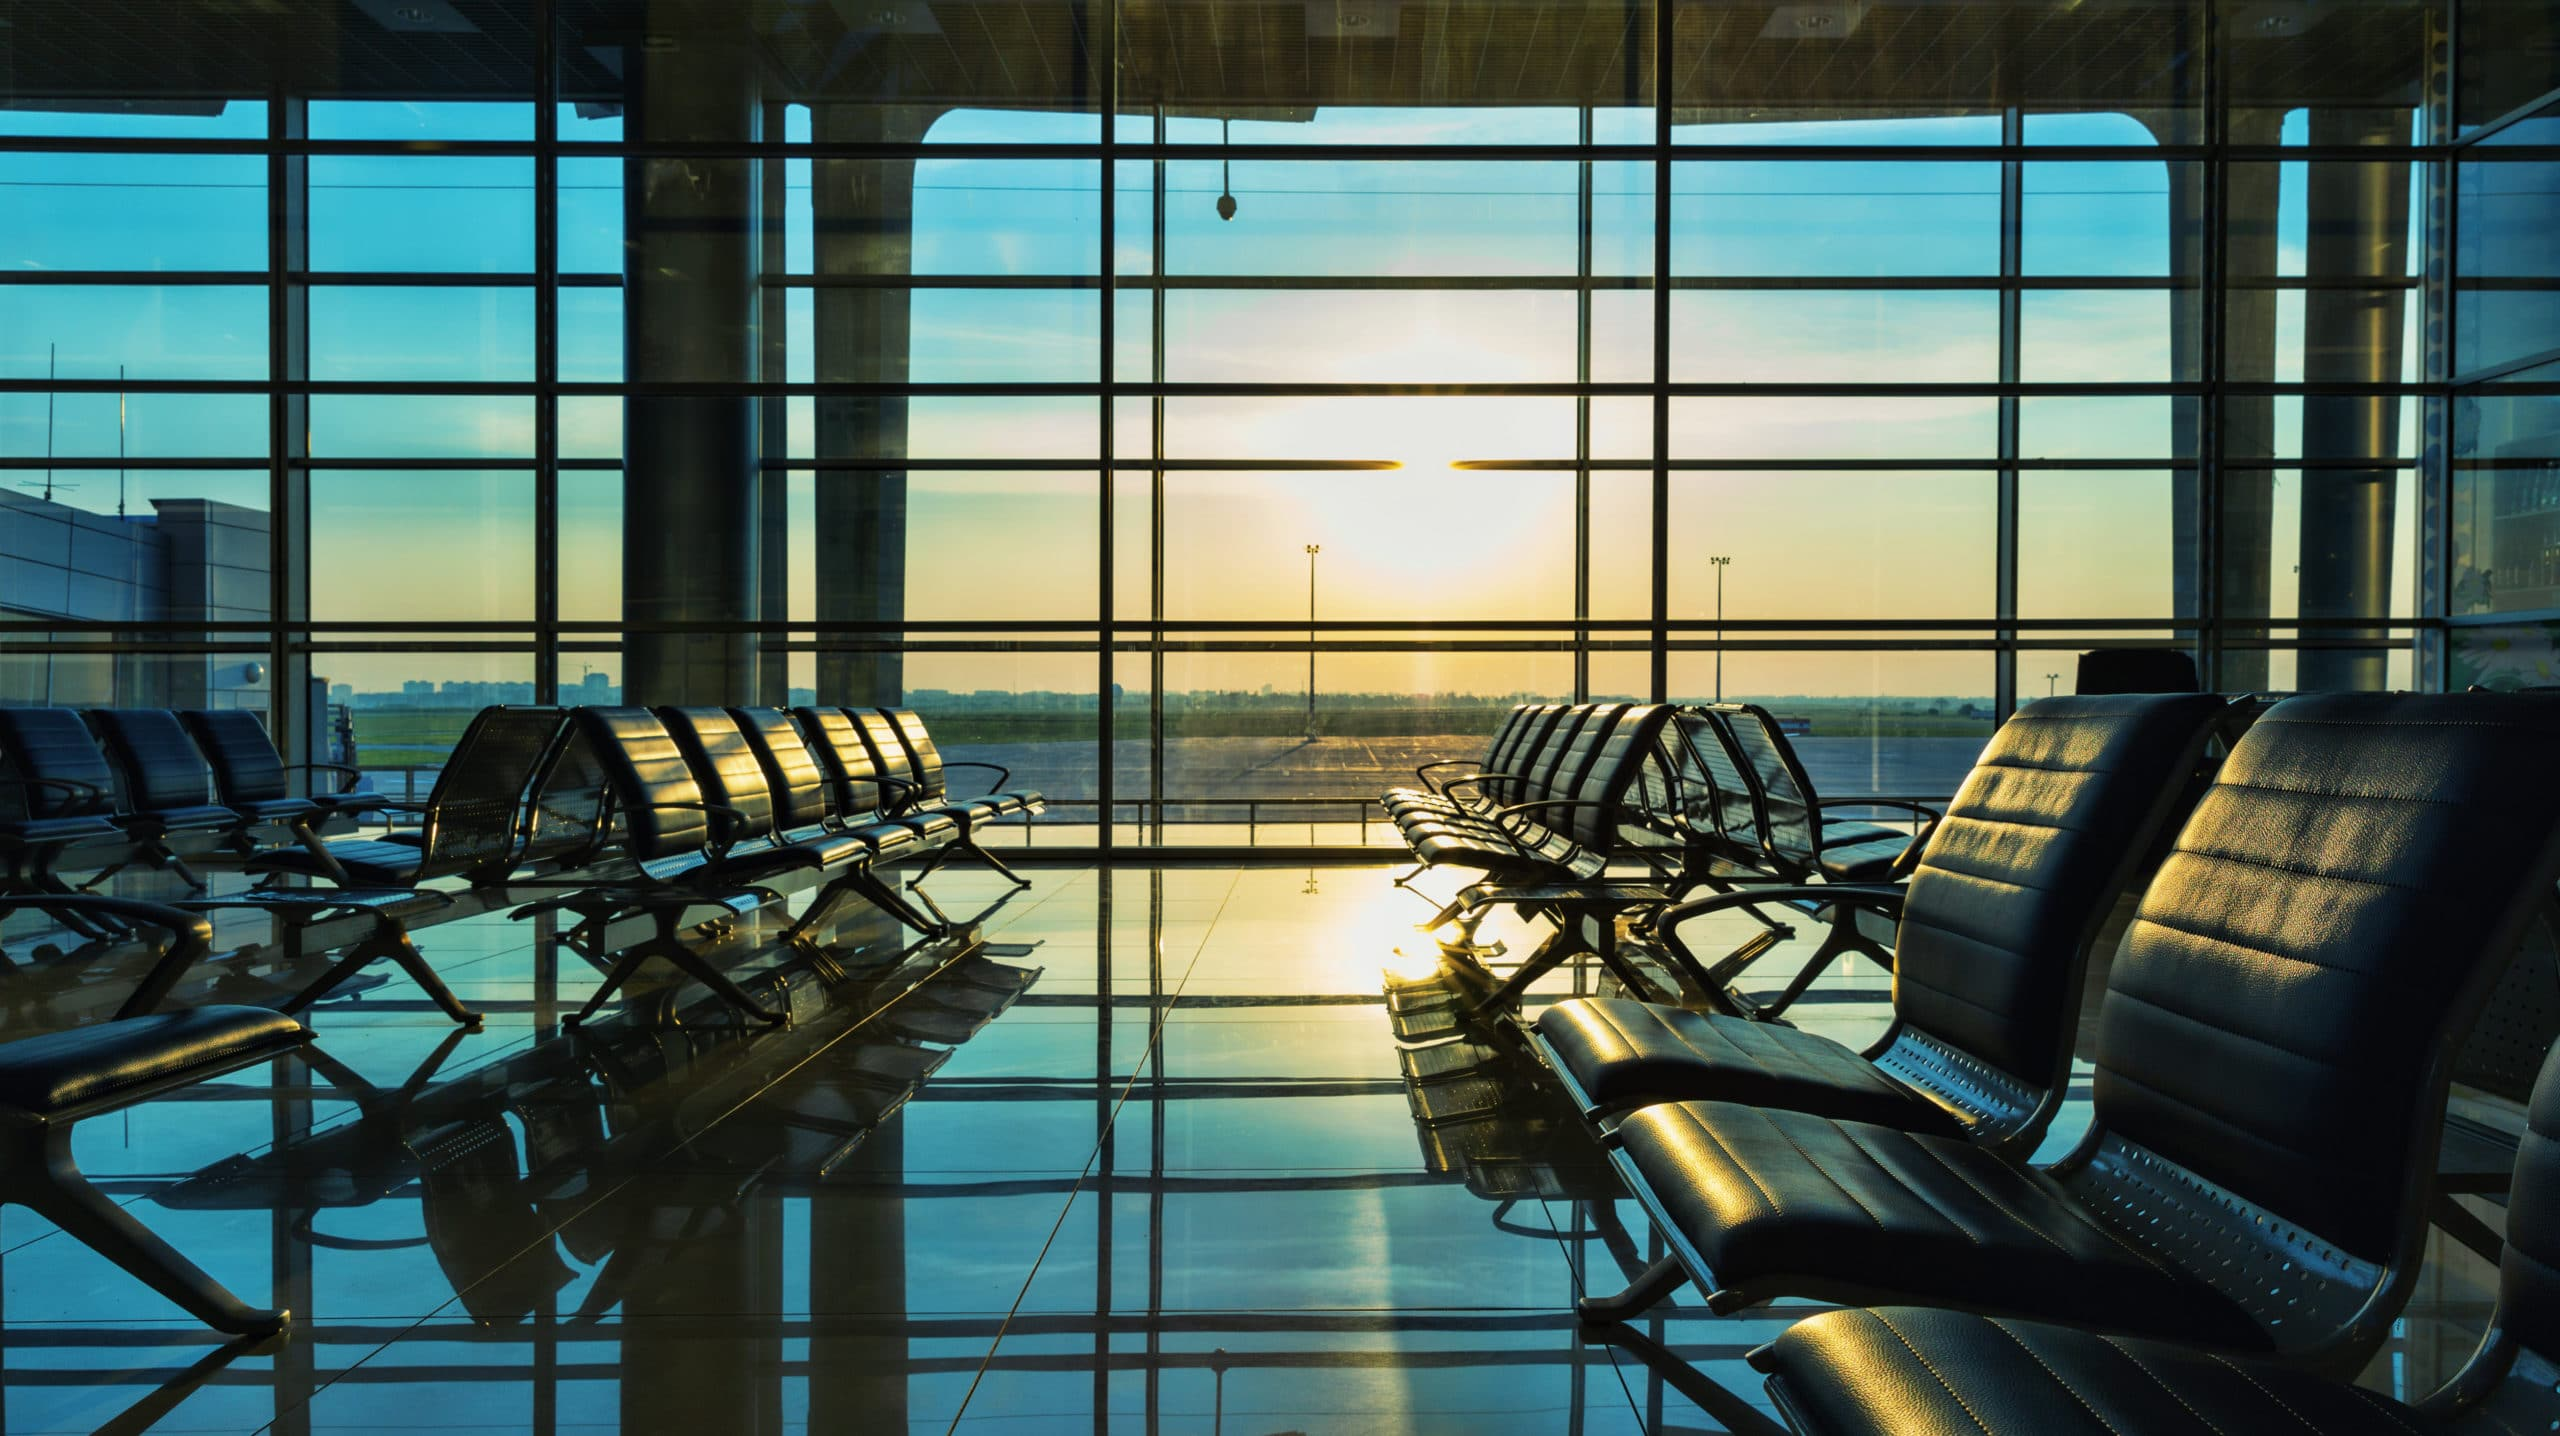 taxi-lyon-aéroport-my-taxi-lyon-2019